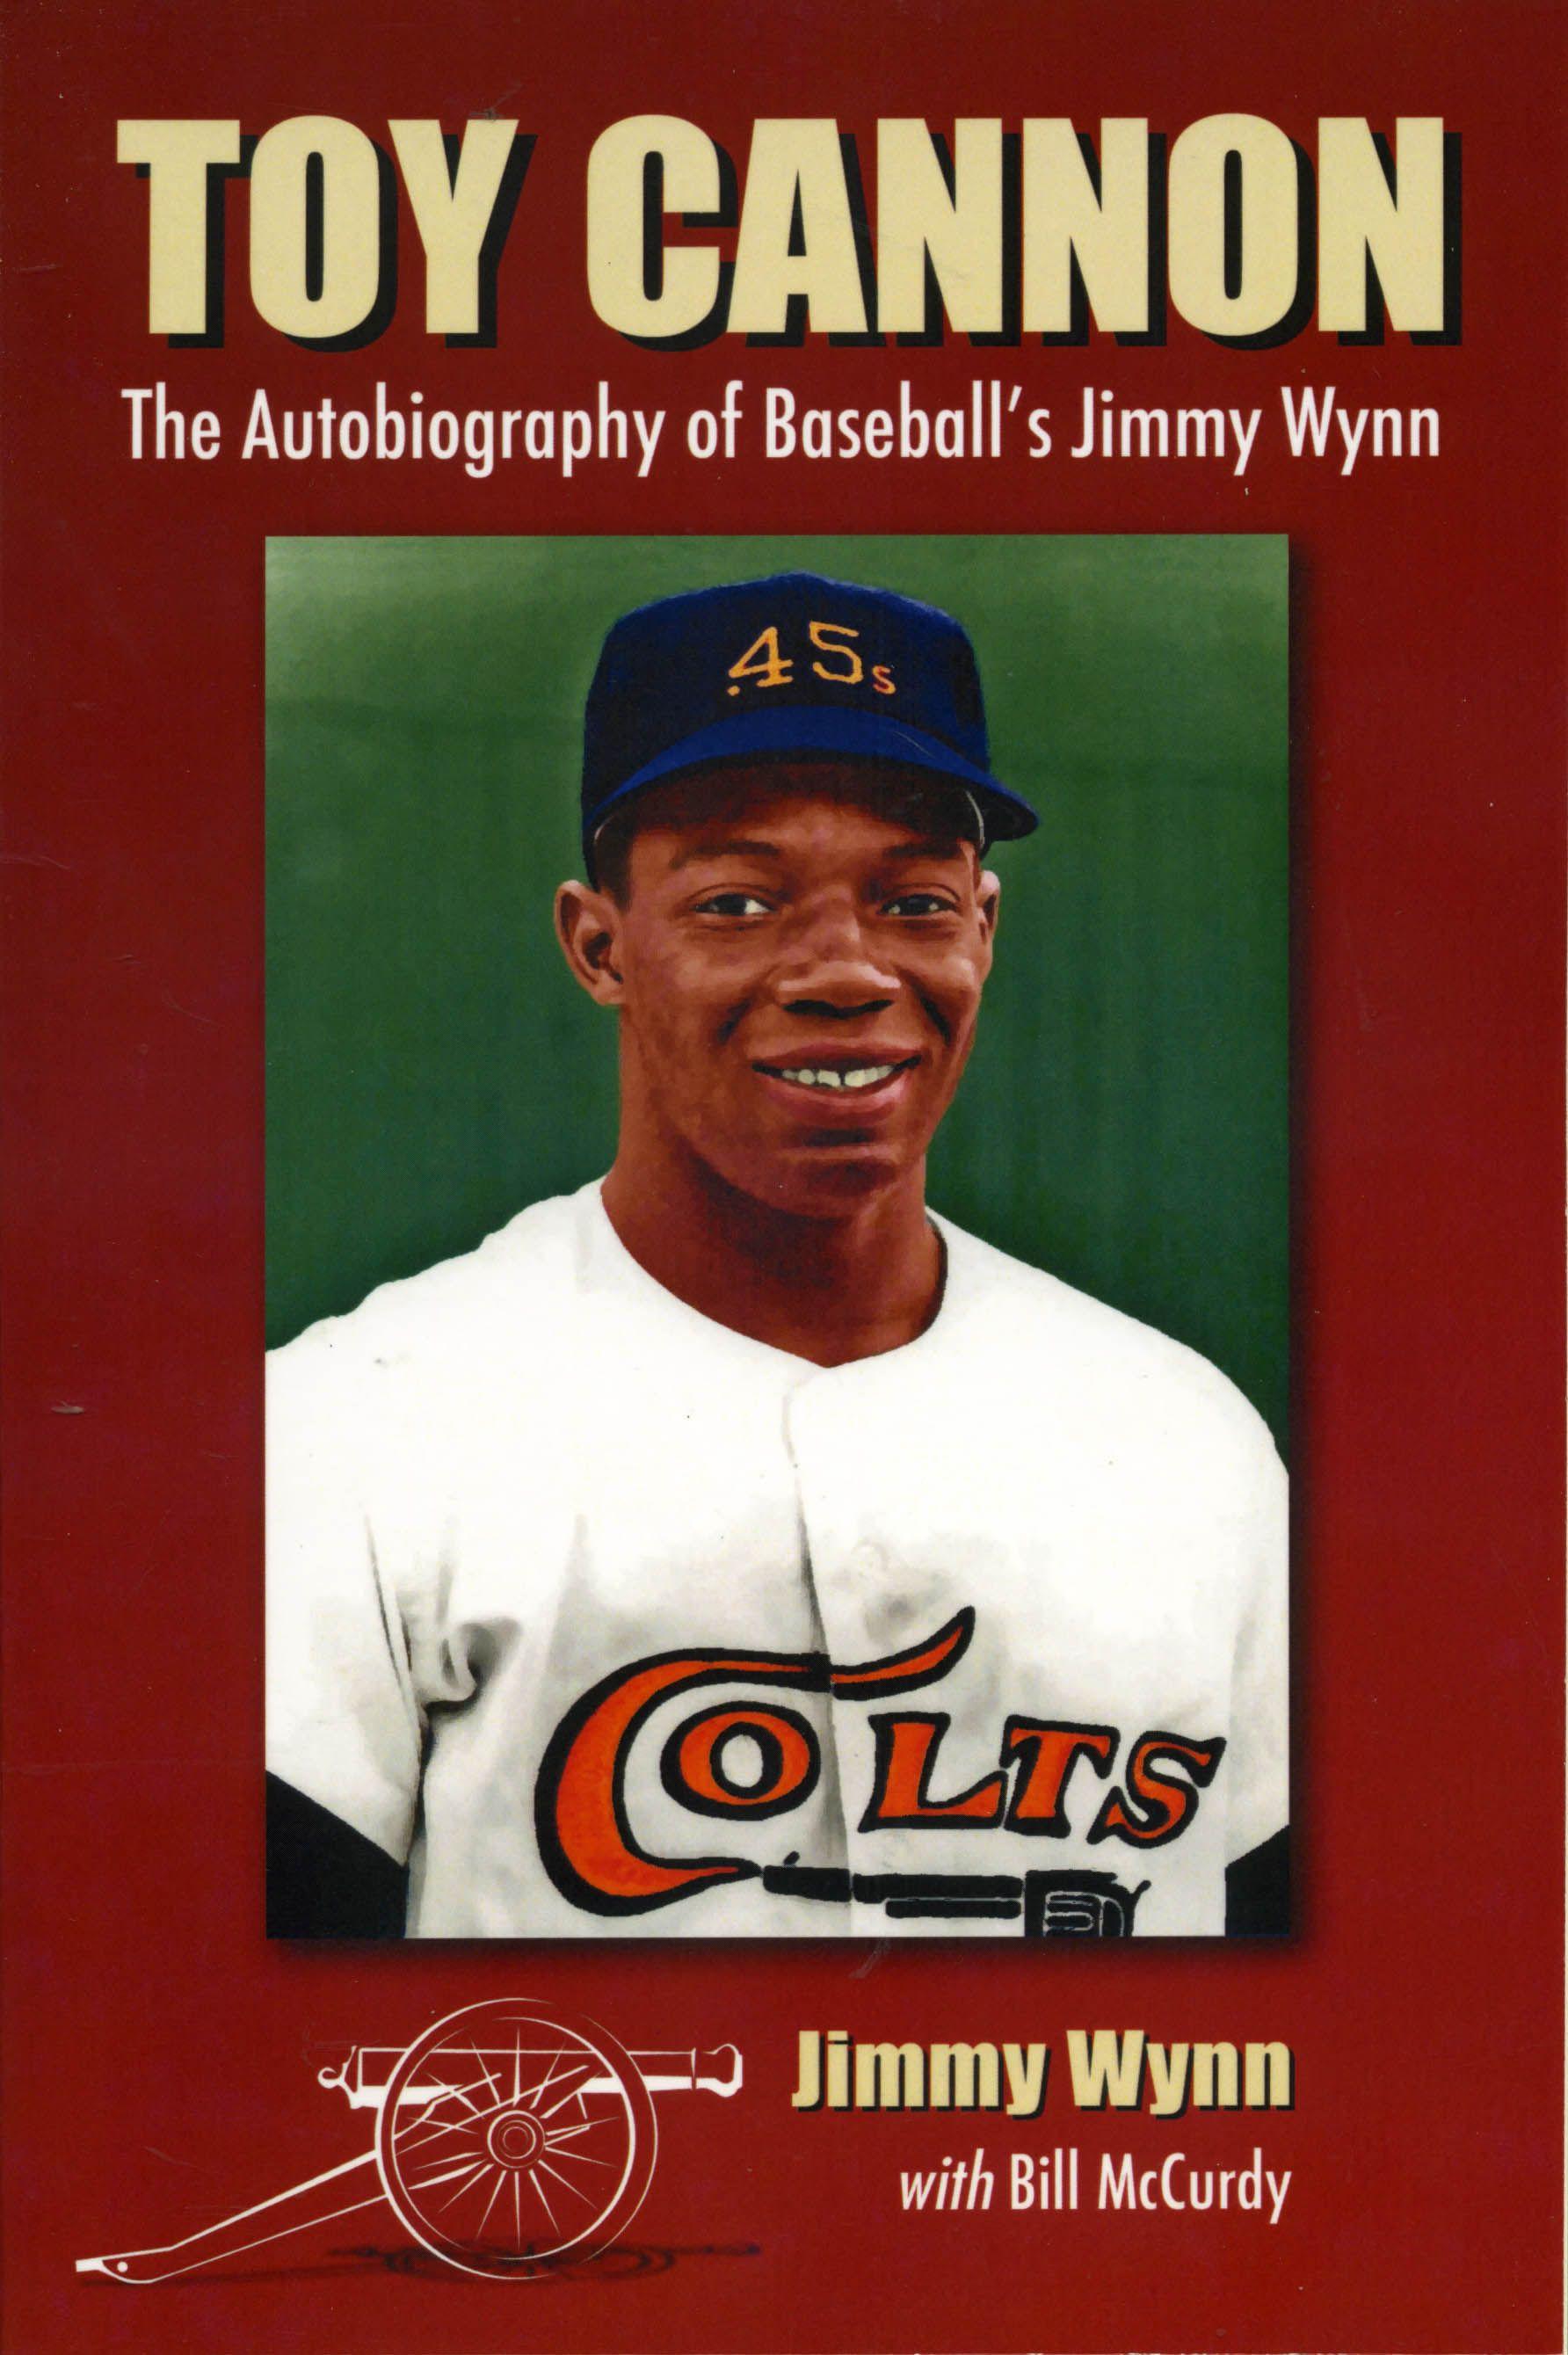 finest selection 3e330 355cd Toy Cannon   Houston Astros   Jimmy wynn, Baseball caps for ...